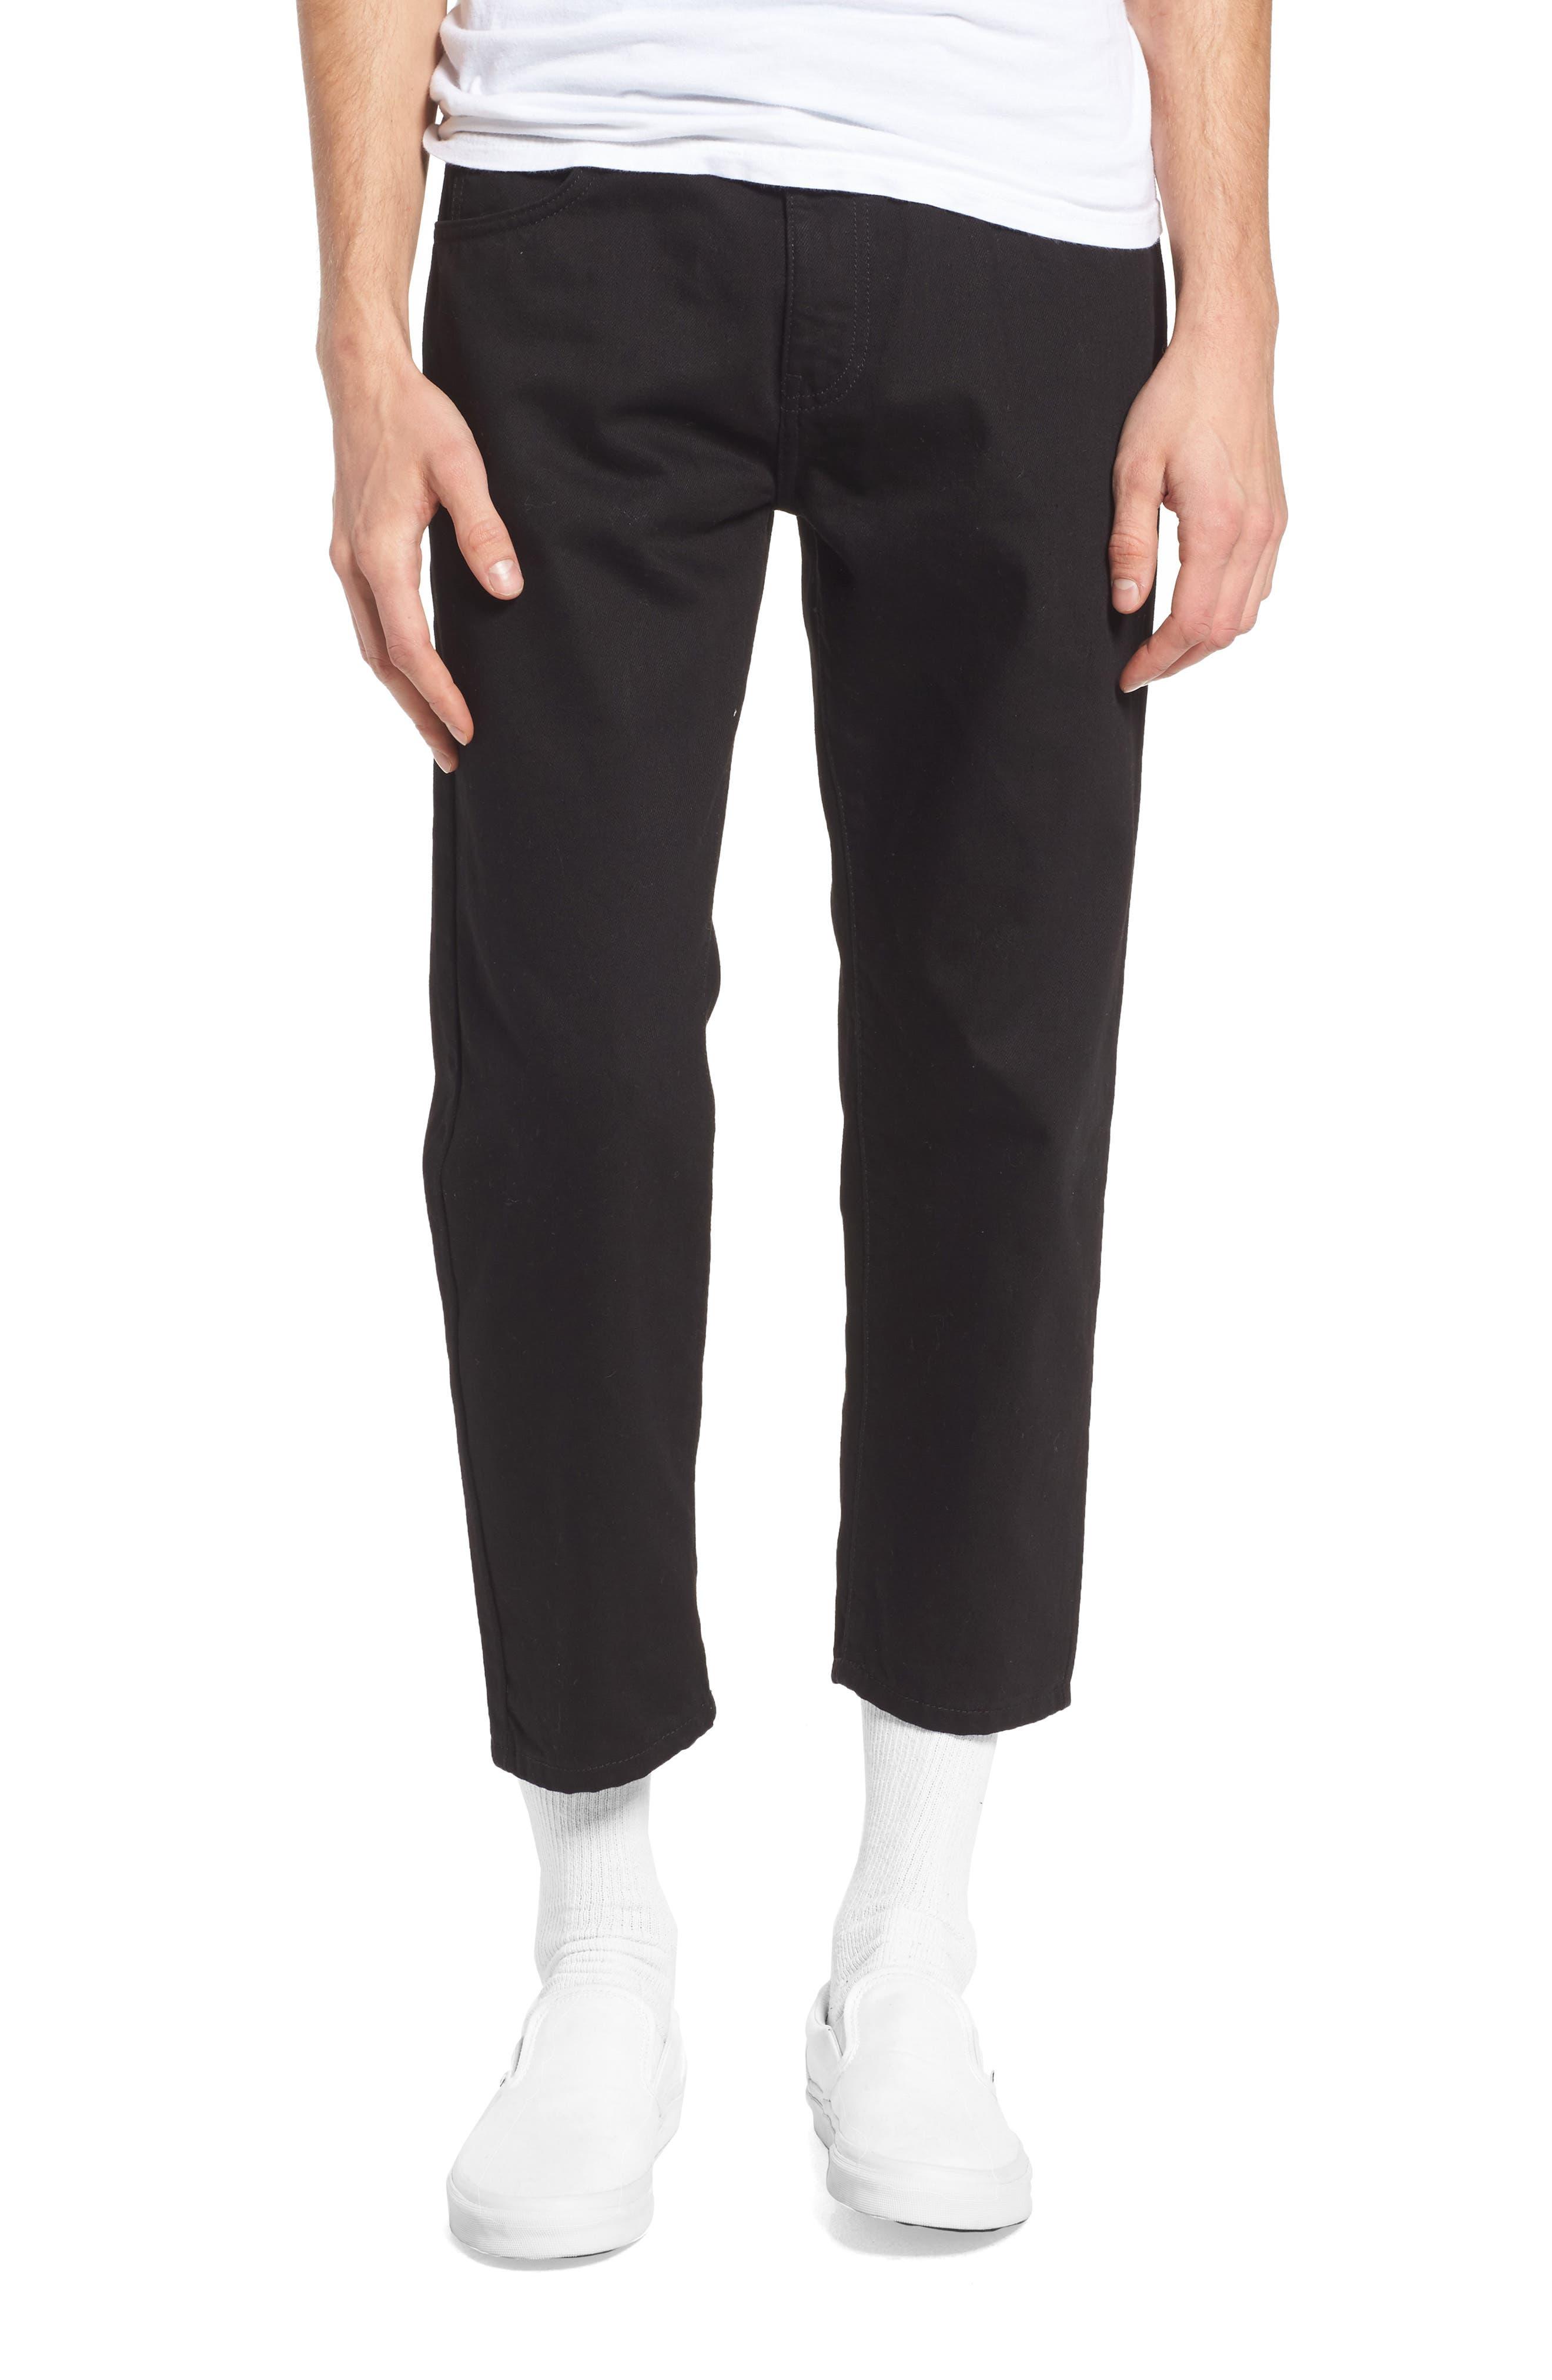 Dr. Denim Supply Co. Otis Straight Fit Crop Jeans